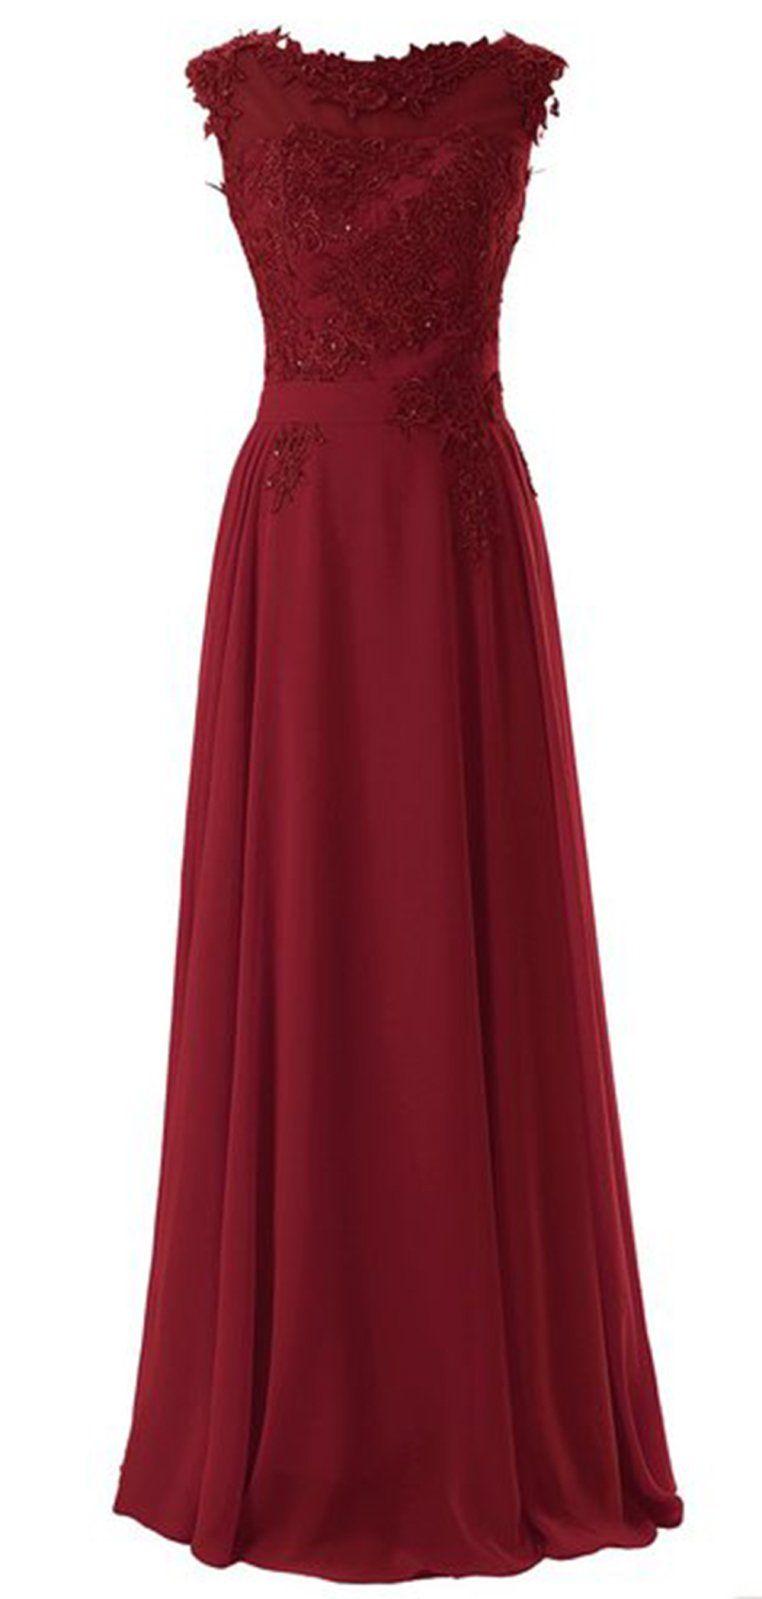 Amazon rotes kleid lang stilvolle kleider in dieser saison - Rotes kleid amazon ...